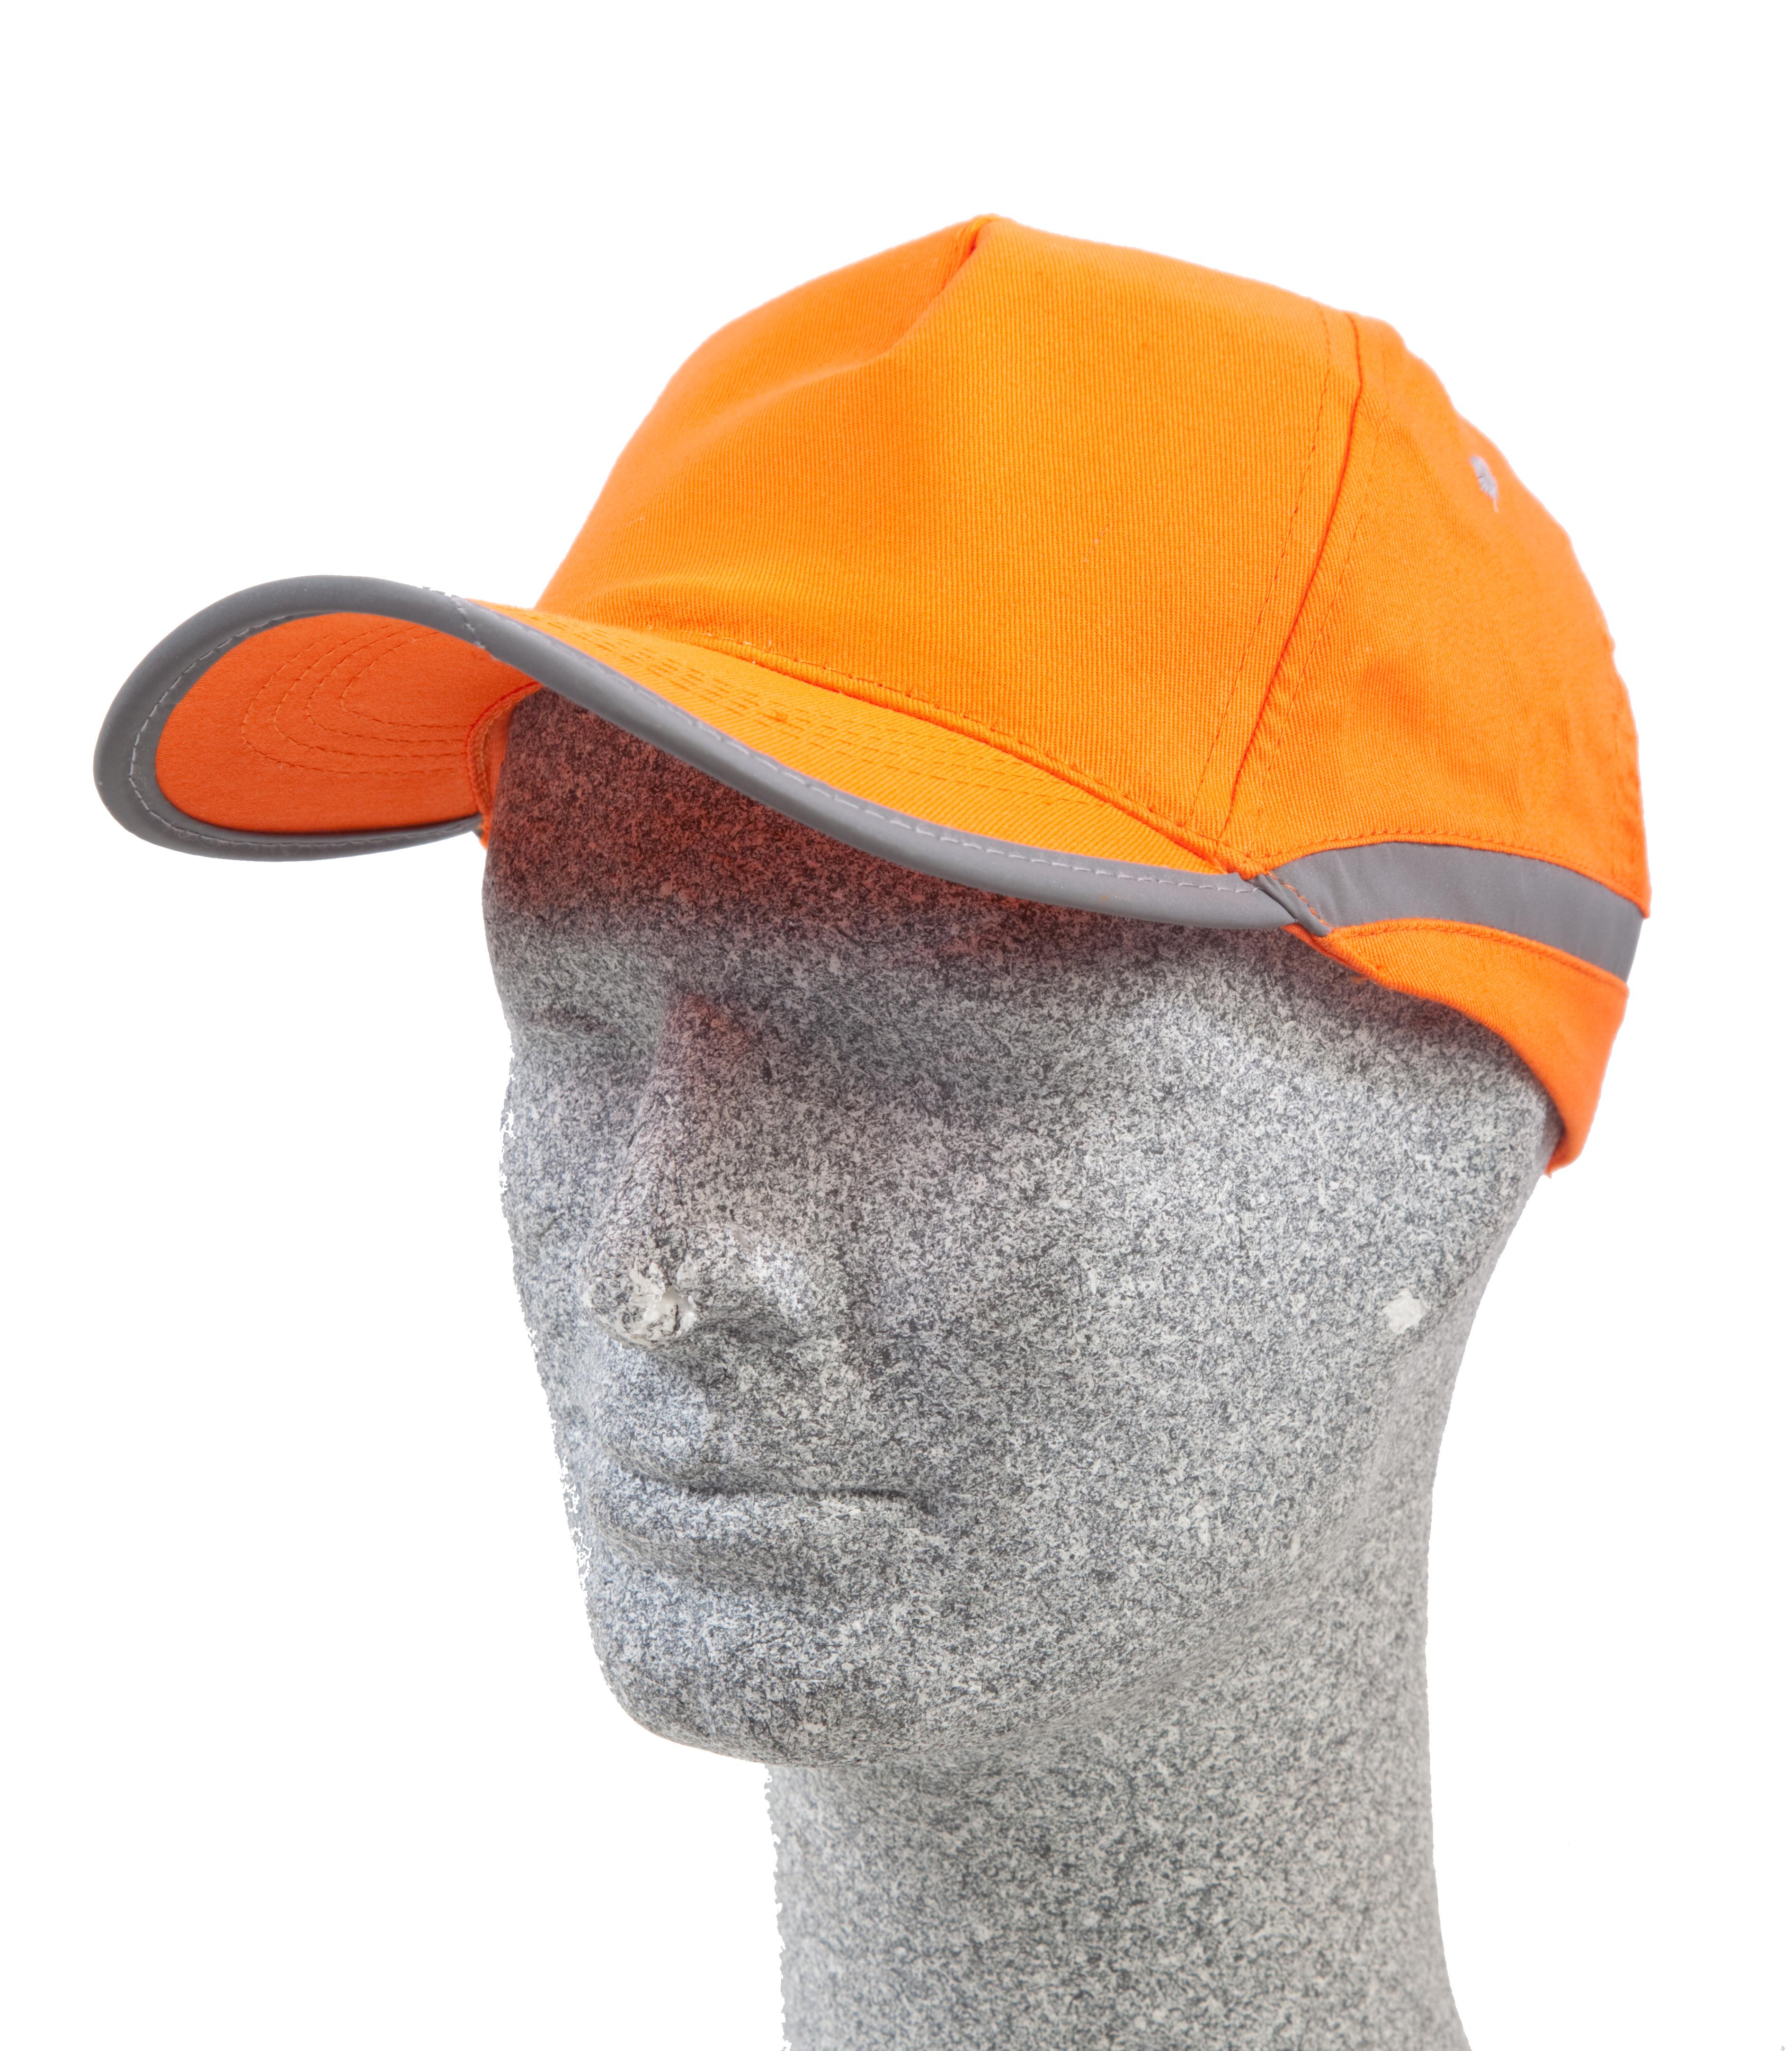 Basecap, Wollmütze & Fleeceartikel